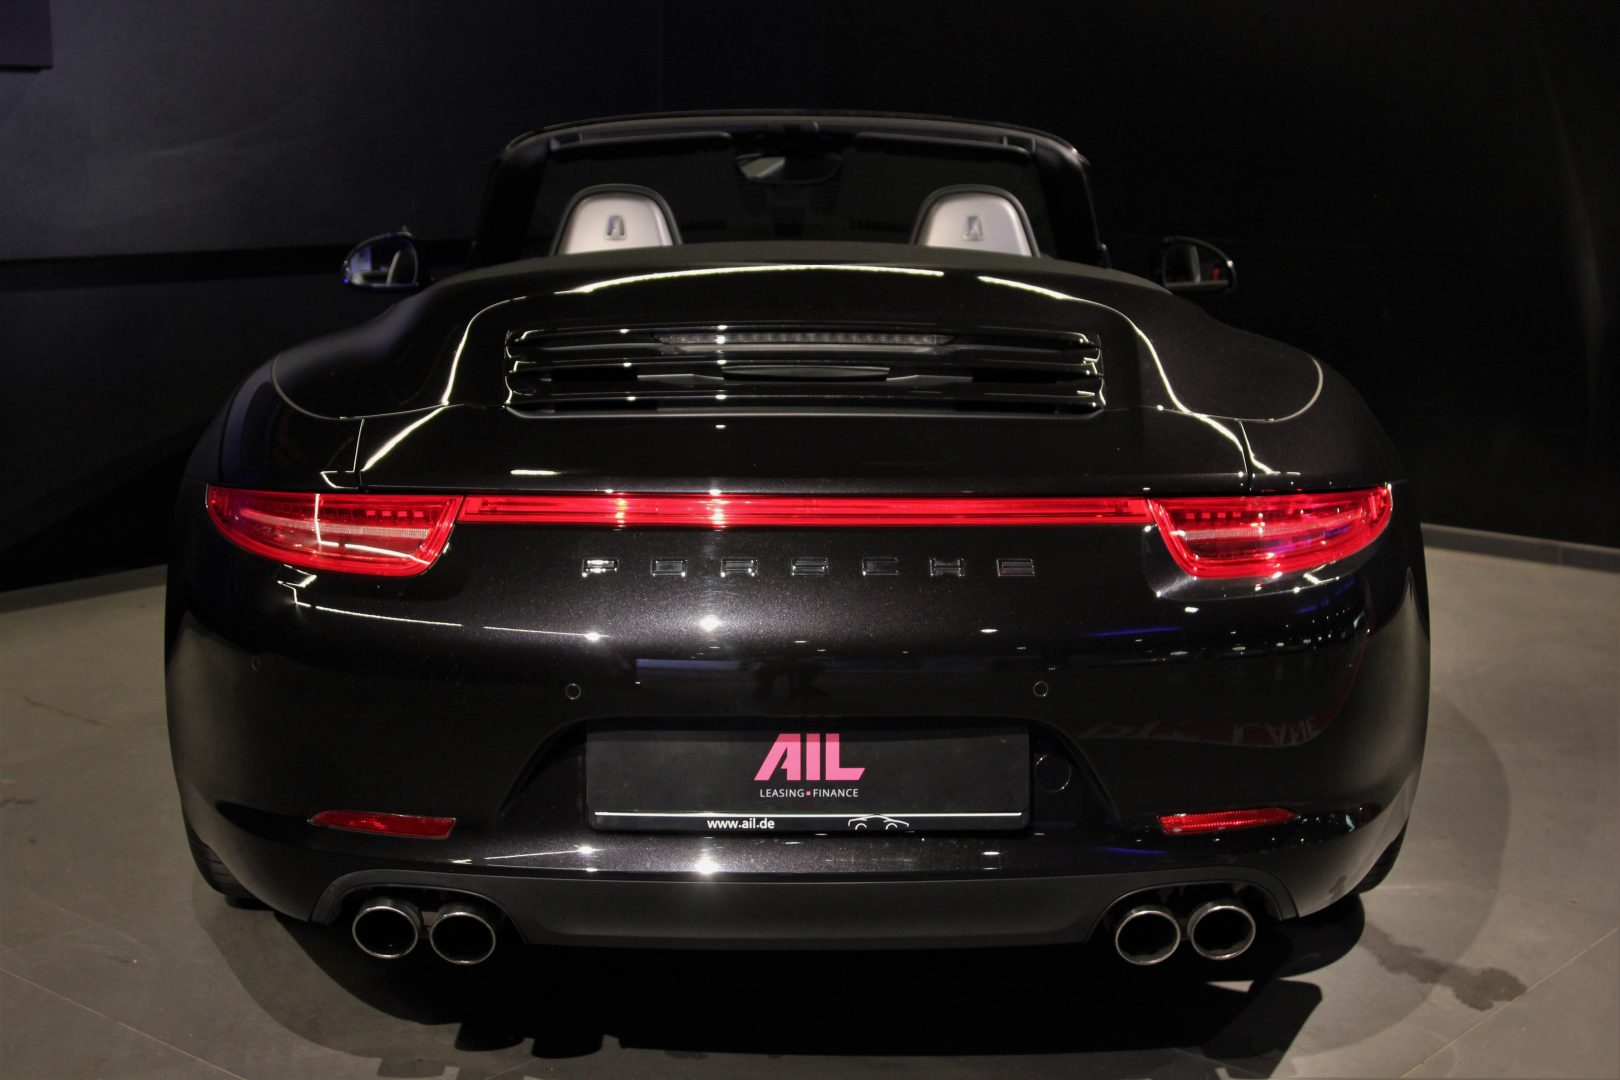 AIL Porsche 911 991 Carrera 4S Cabriolet 9